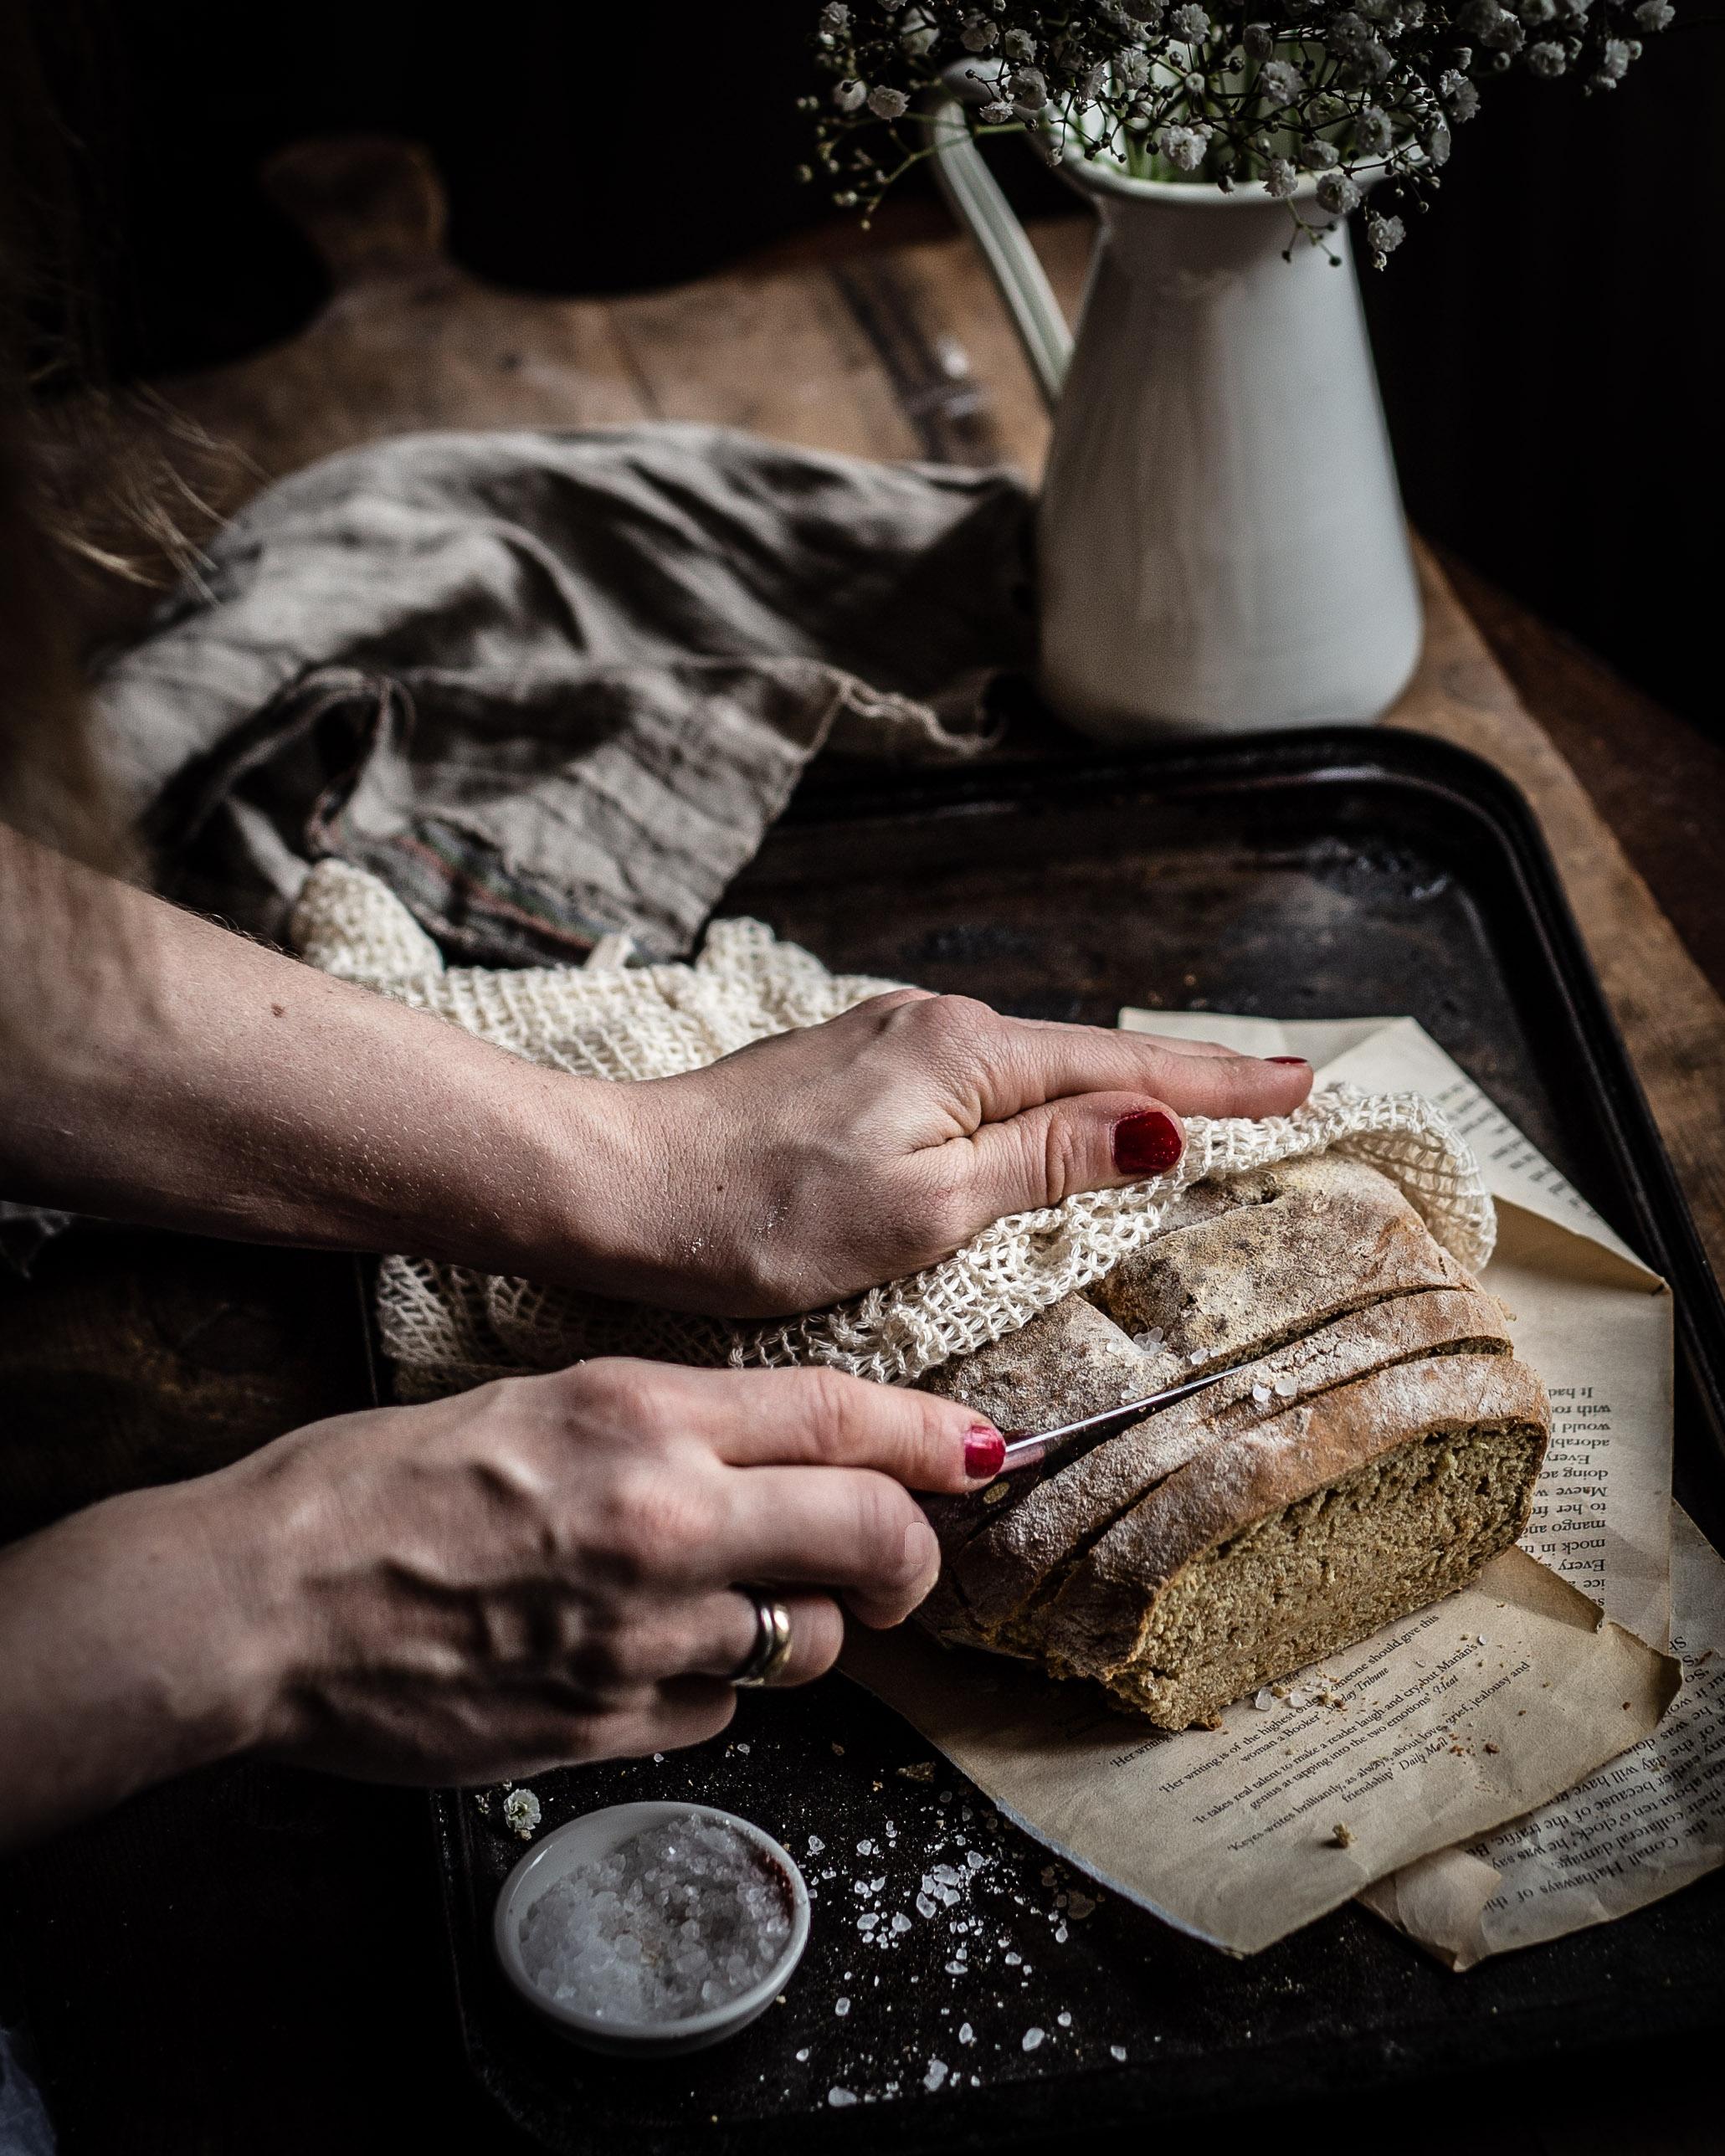 Soda Bread Making Off-0010-2.jpg